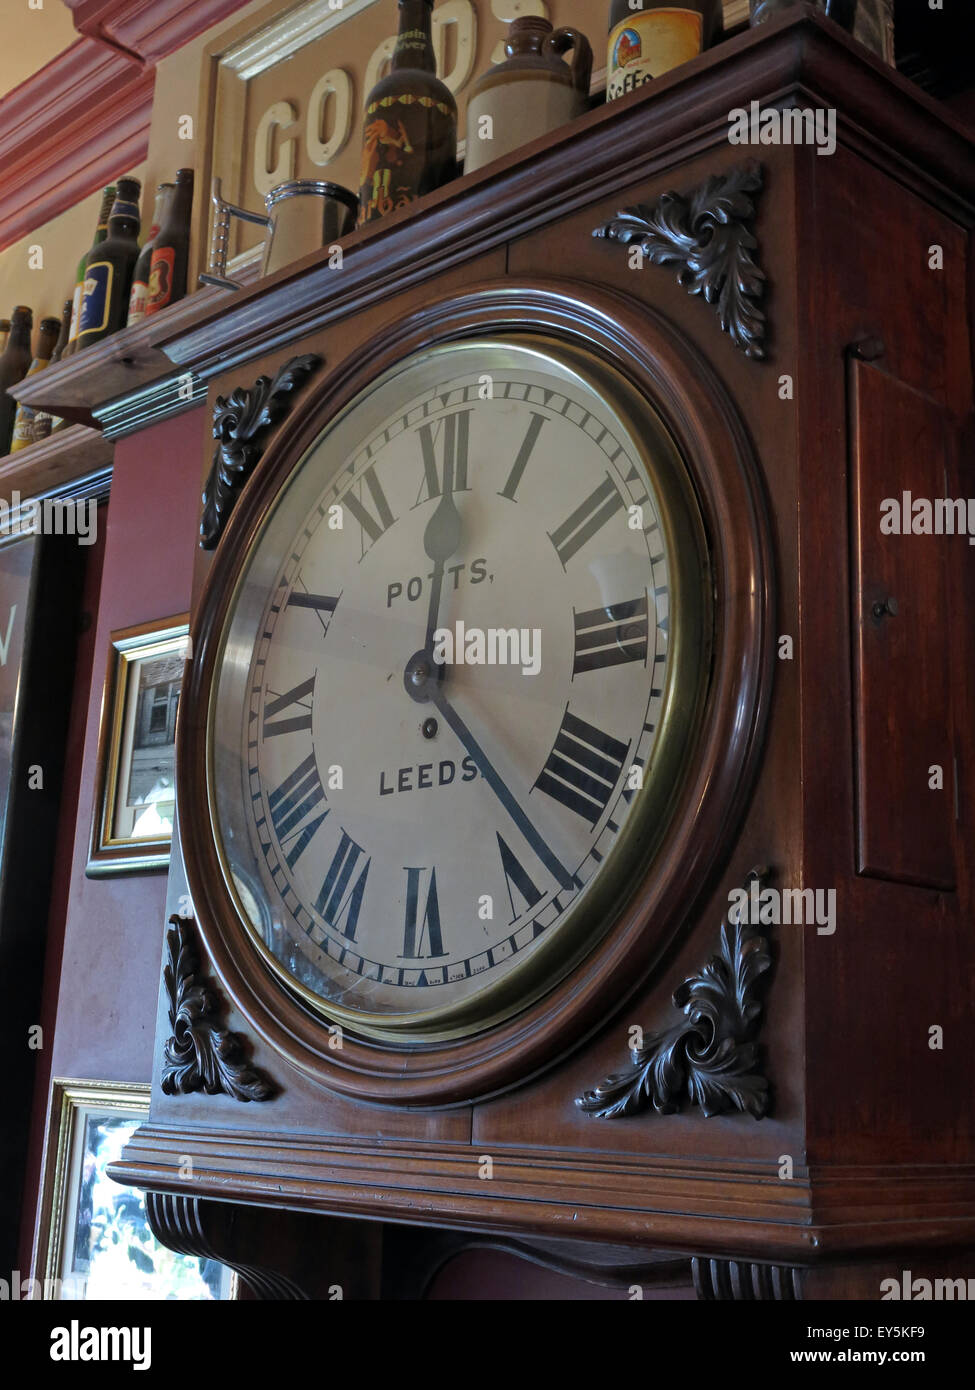 West Riding Pub, Dewsbury Railway Station, West Yorkshire, England, UK - Potts Timepiece Stock Photo